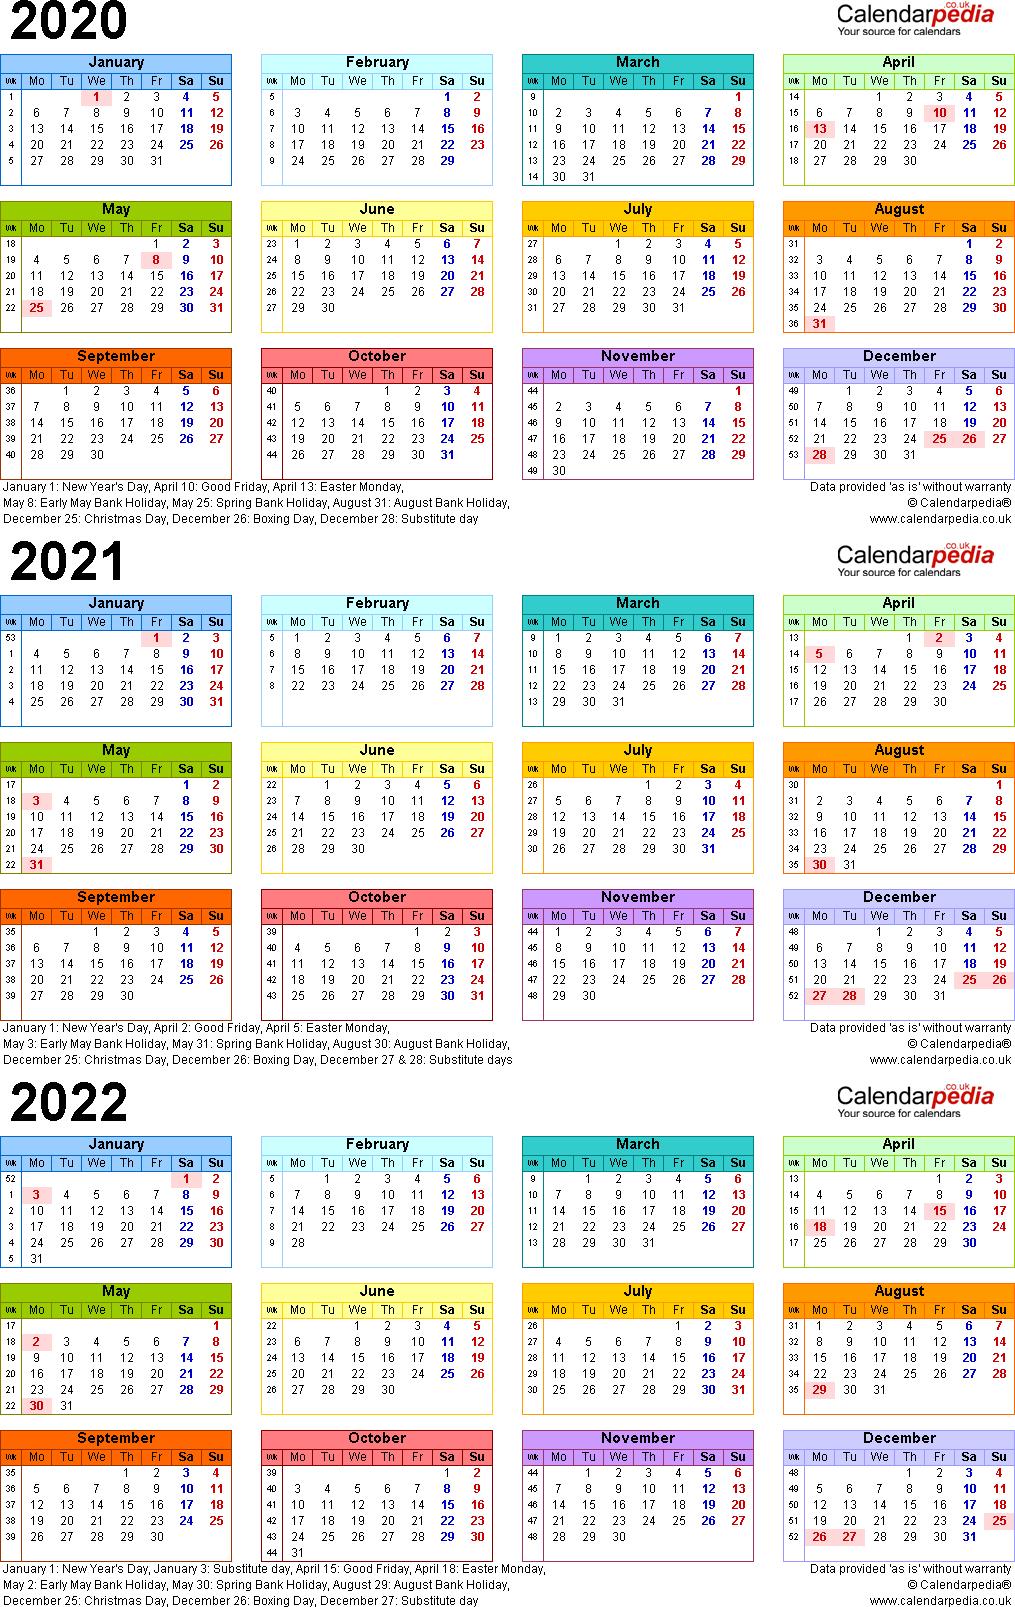 3 Year Calendar 2020 To 2022